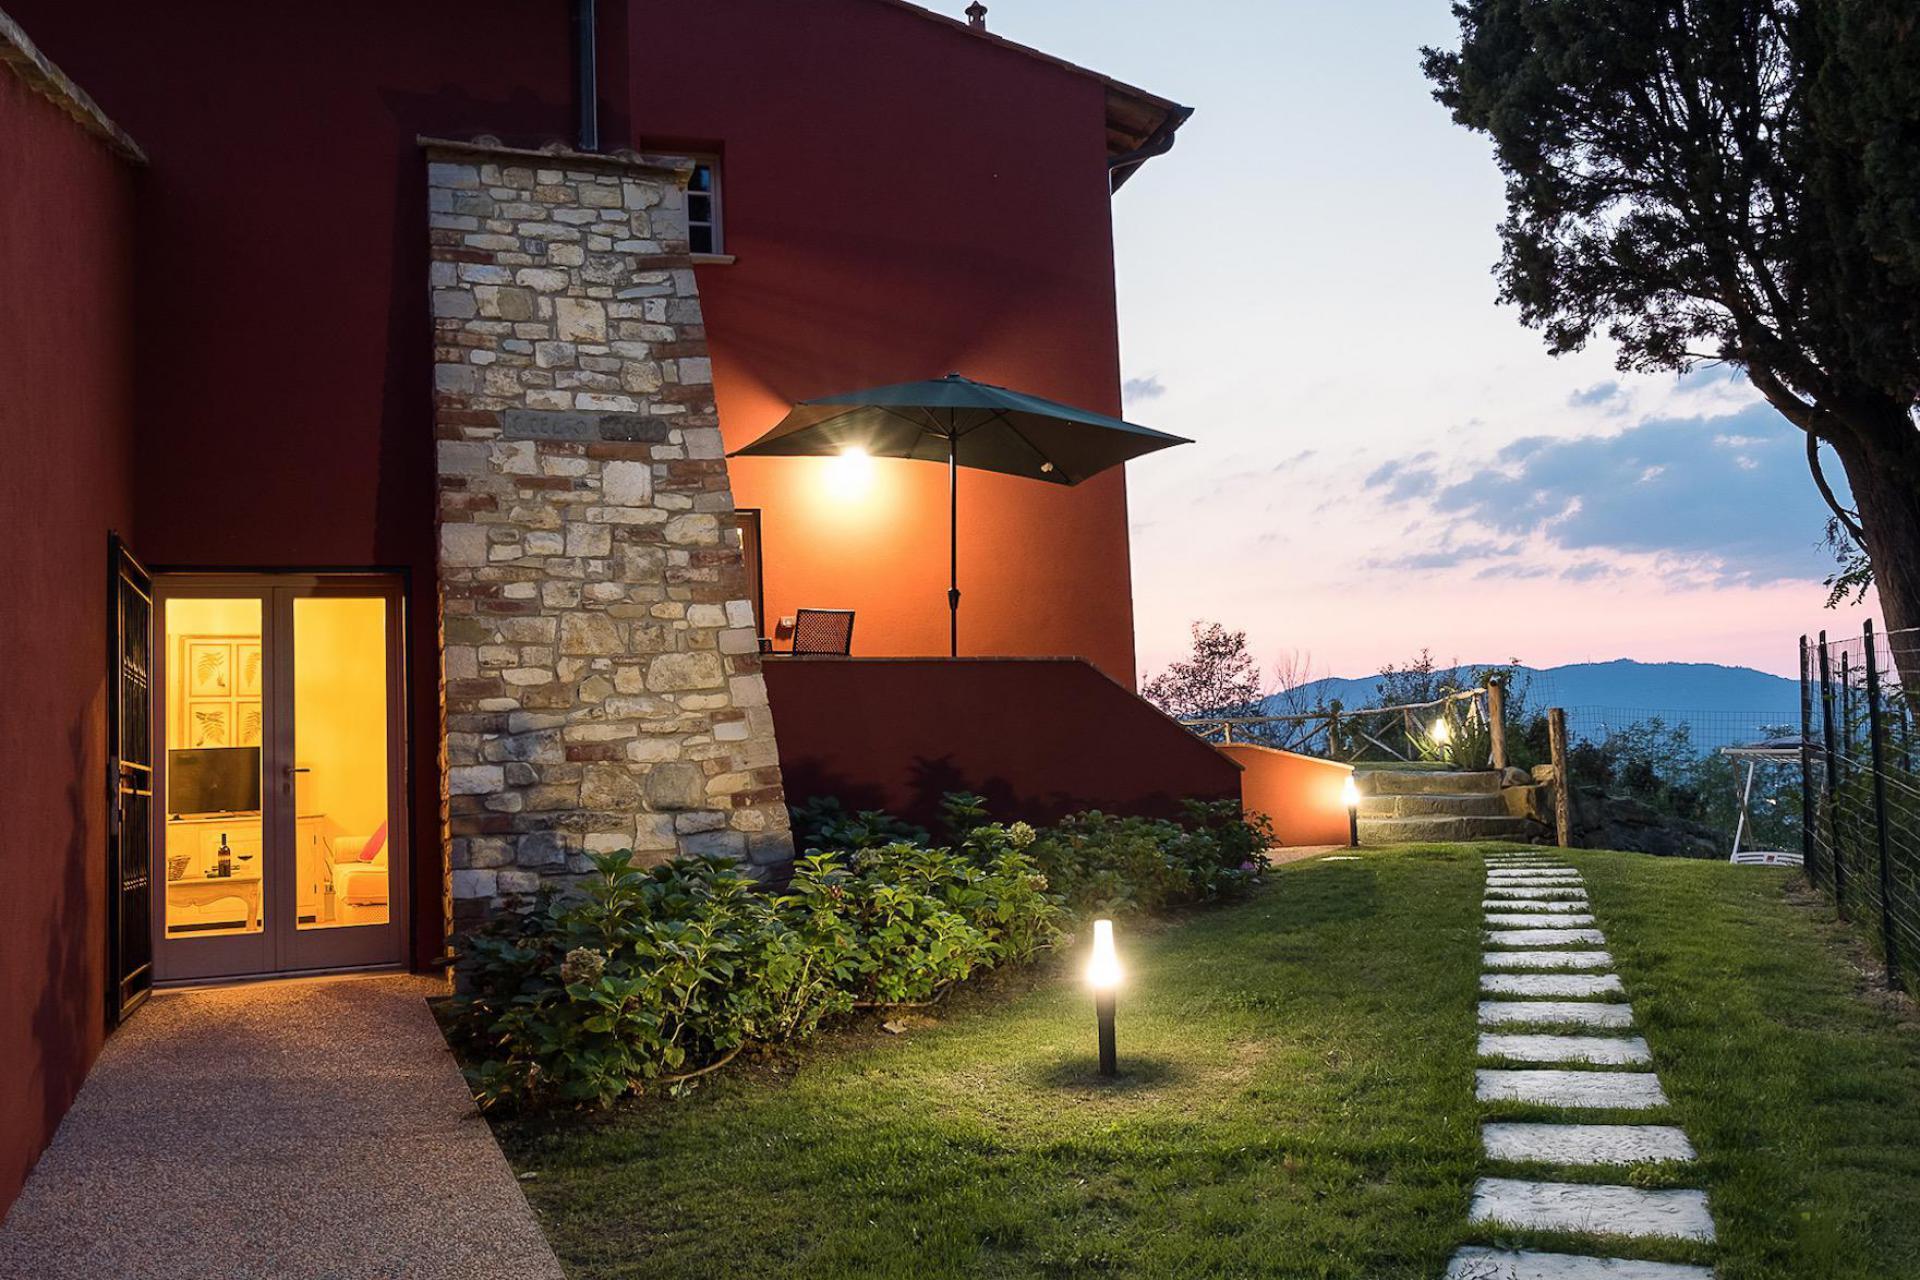 Agriturismo Toskana 11 Wohnungen mit Design-Interieur in der Toskana | myitalyselection.de